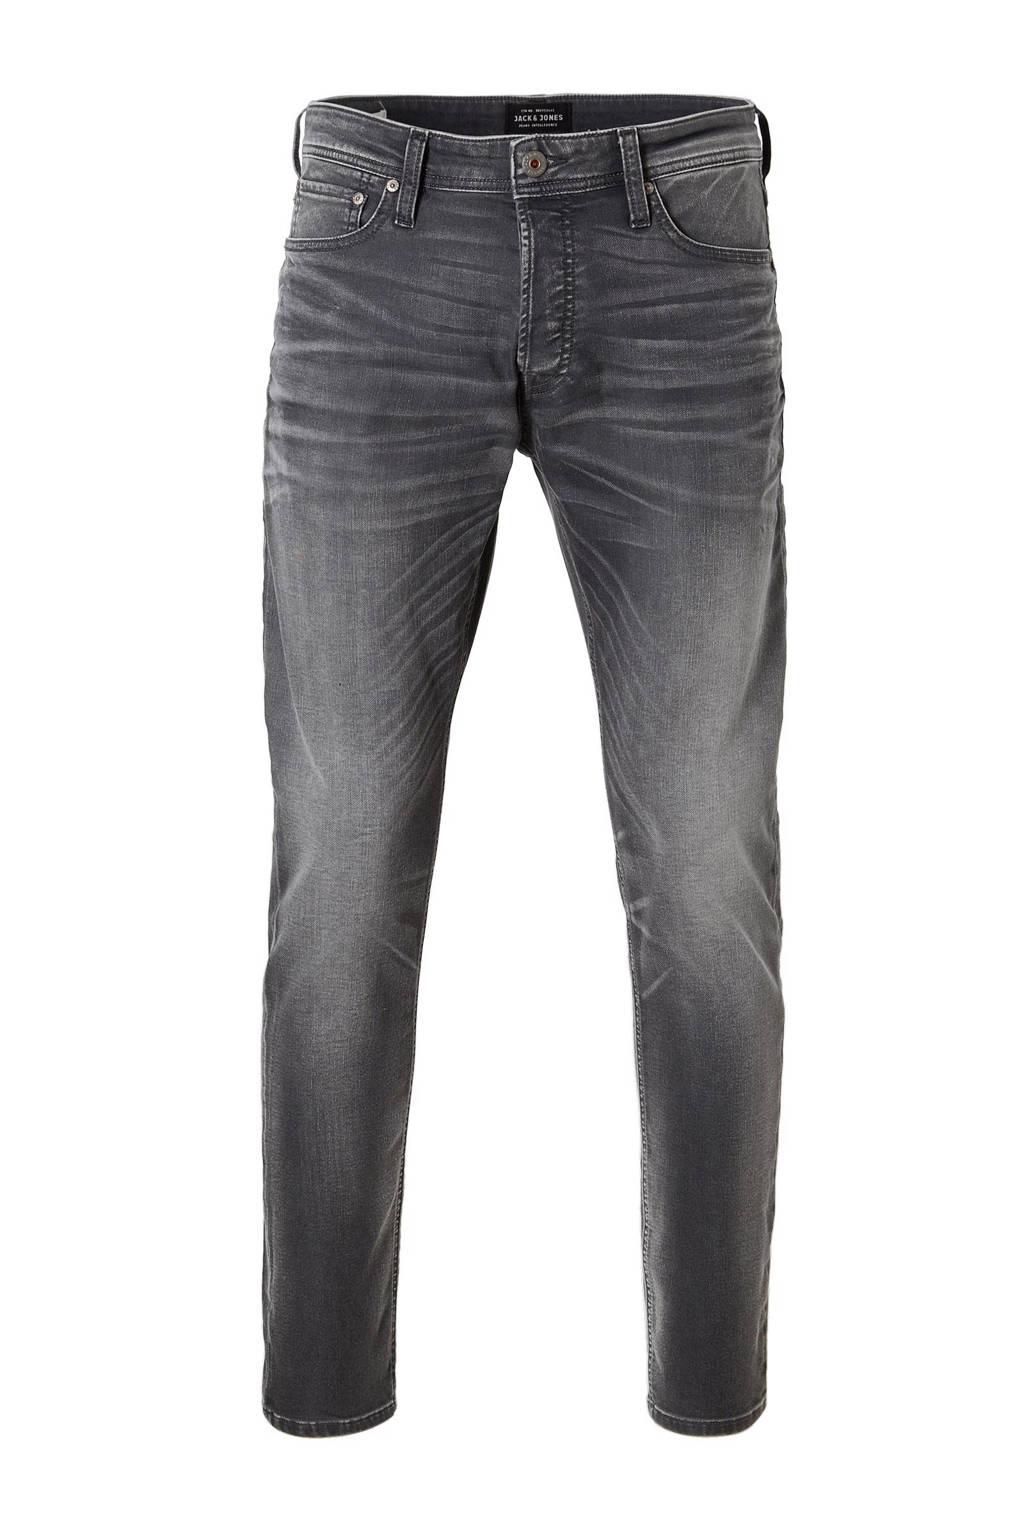 Jack & Jones regular fit comfort jeans Mike, 197 Grey Denim